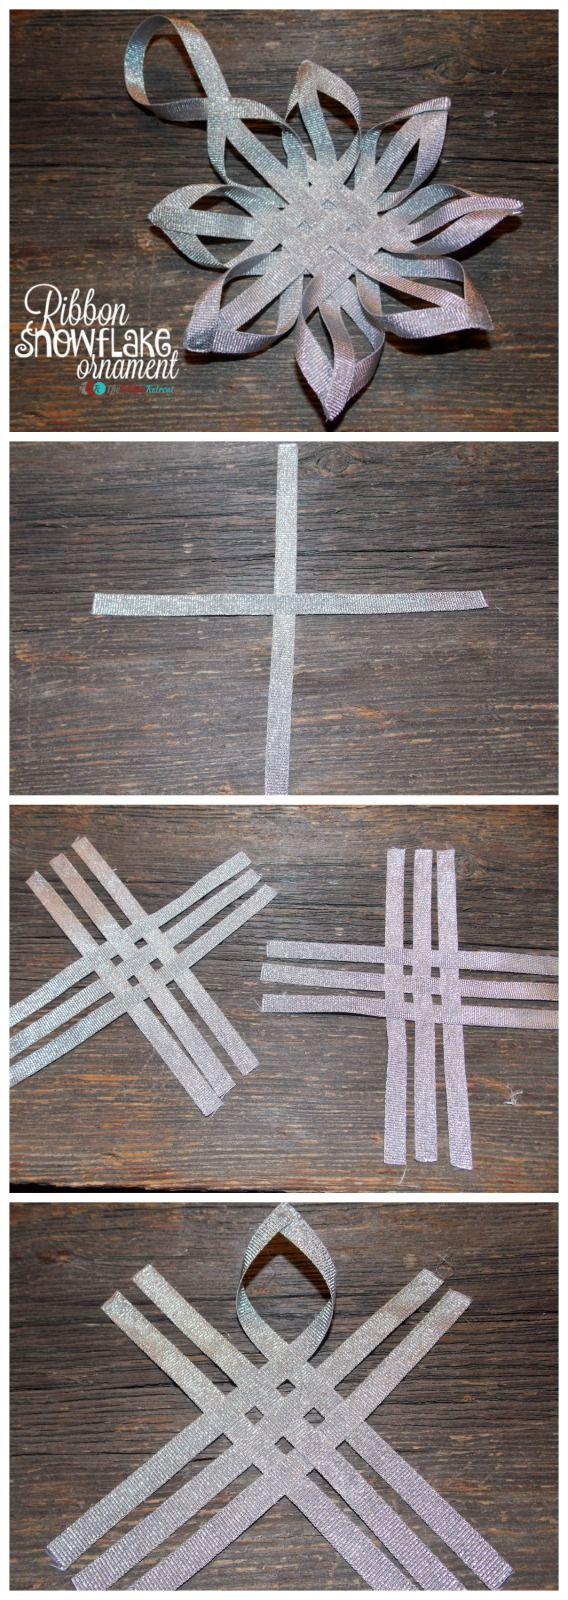 Paper tissue snowflake christmas decorations - Ribbon Snowflake Ornament The Ribbon Retreat Blog Also A Cute Idea For